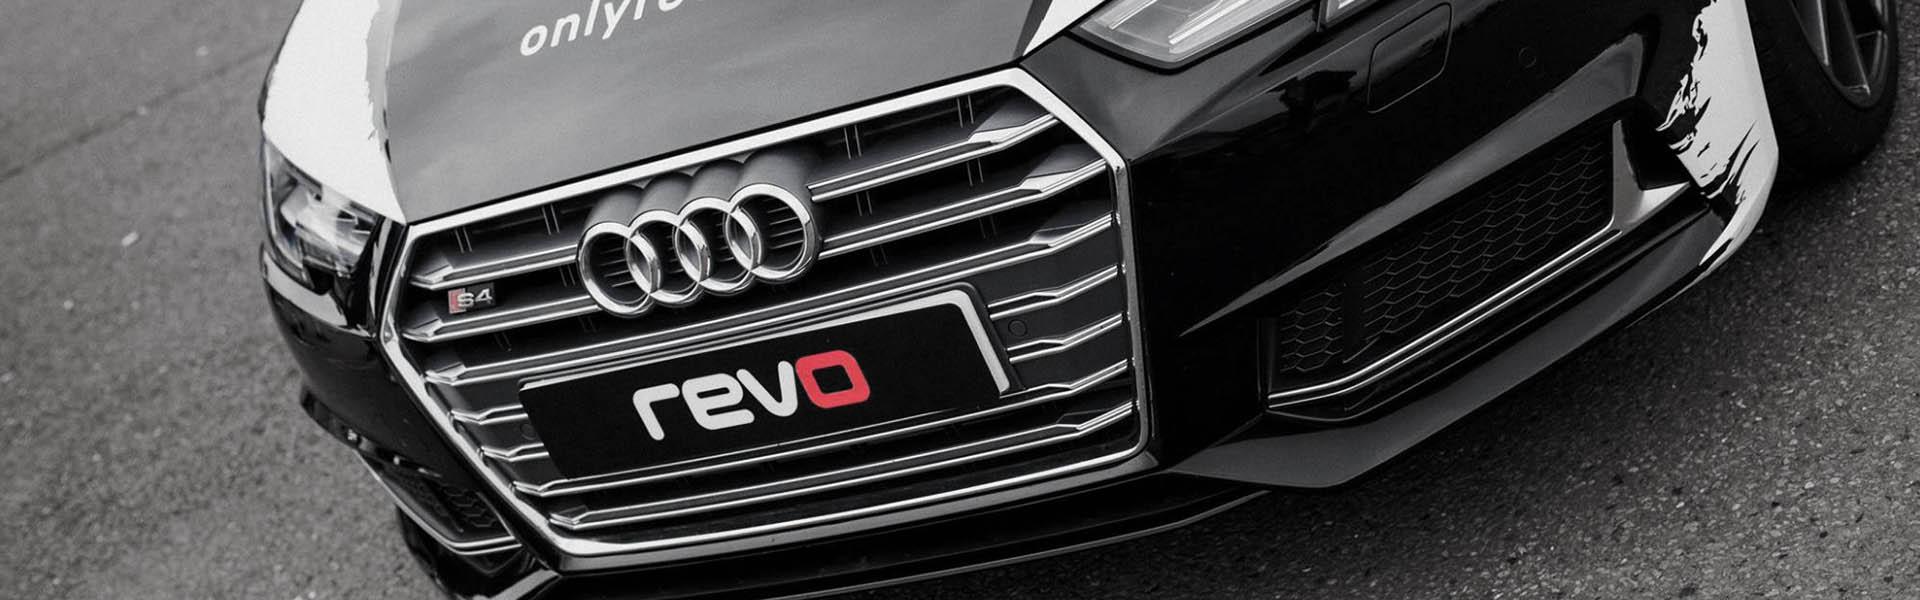 revo racing parts glenrothes